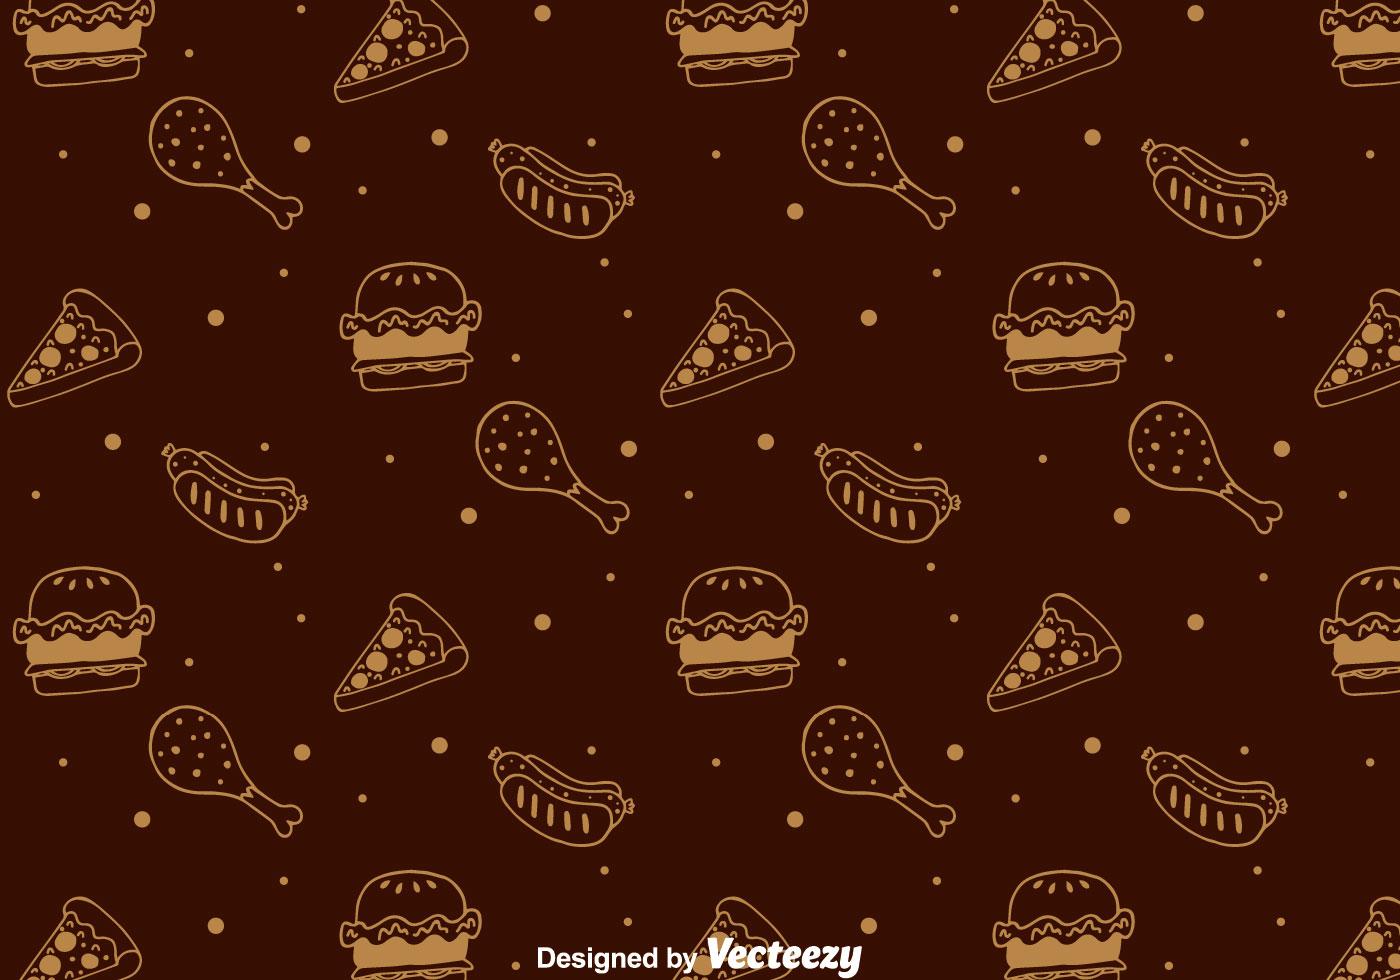 Cute Pizza Wallpaper Hand Drawn Fast Food Pattern Download Free Vectors